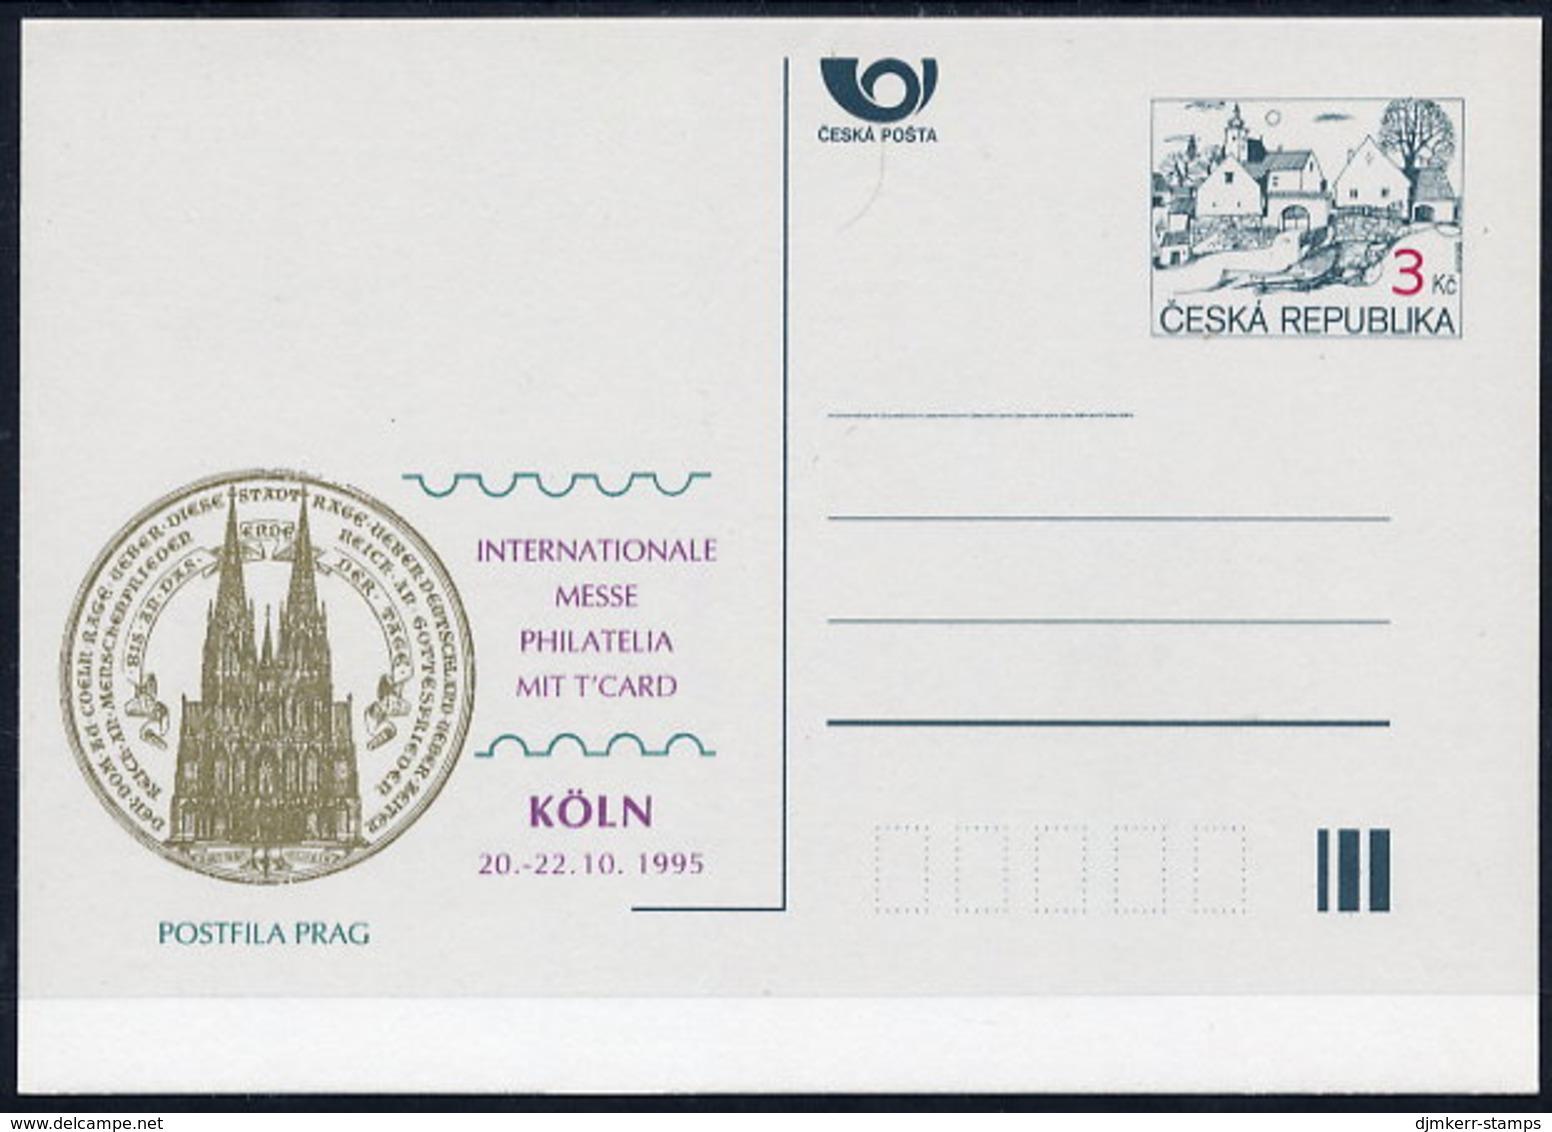 CZECH REPUBLIC 1995 3 Kc.postcard Köln '95 Unused.  Michel P7-A5 - Postal Stationery